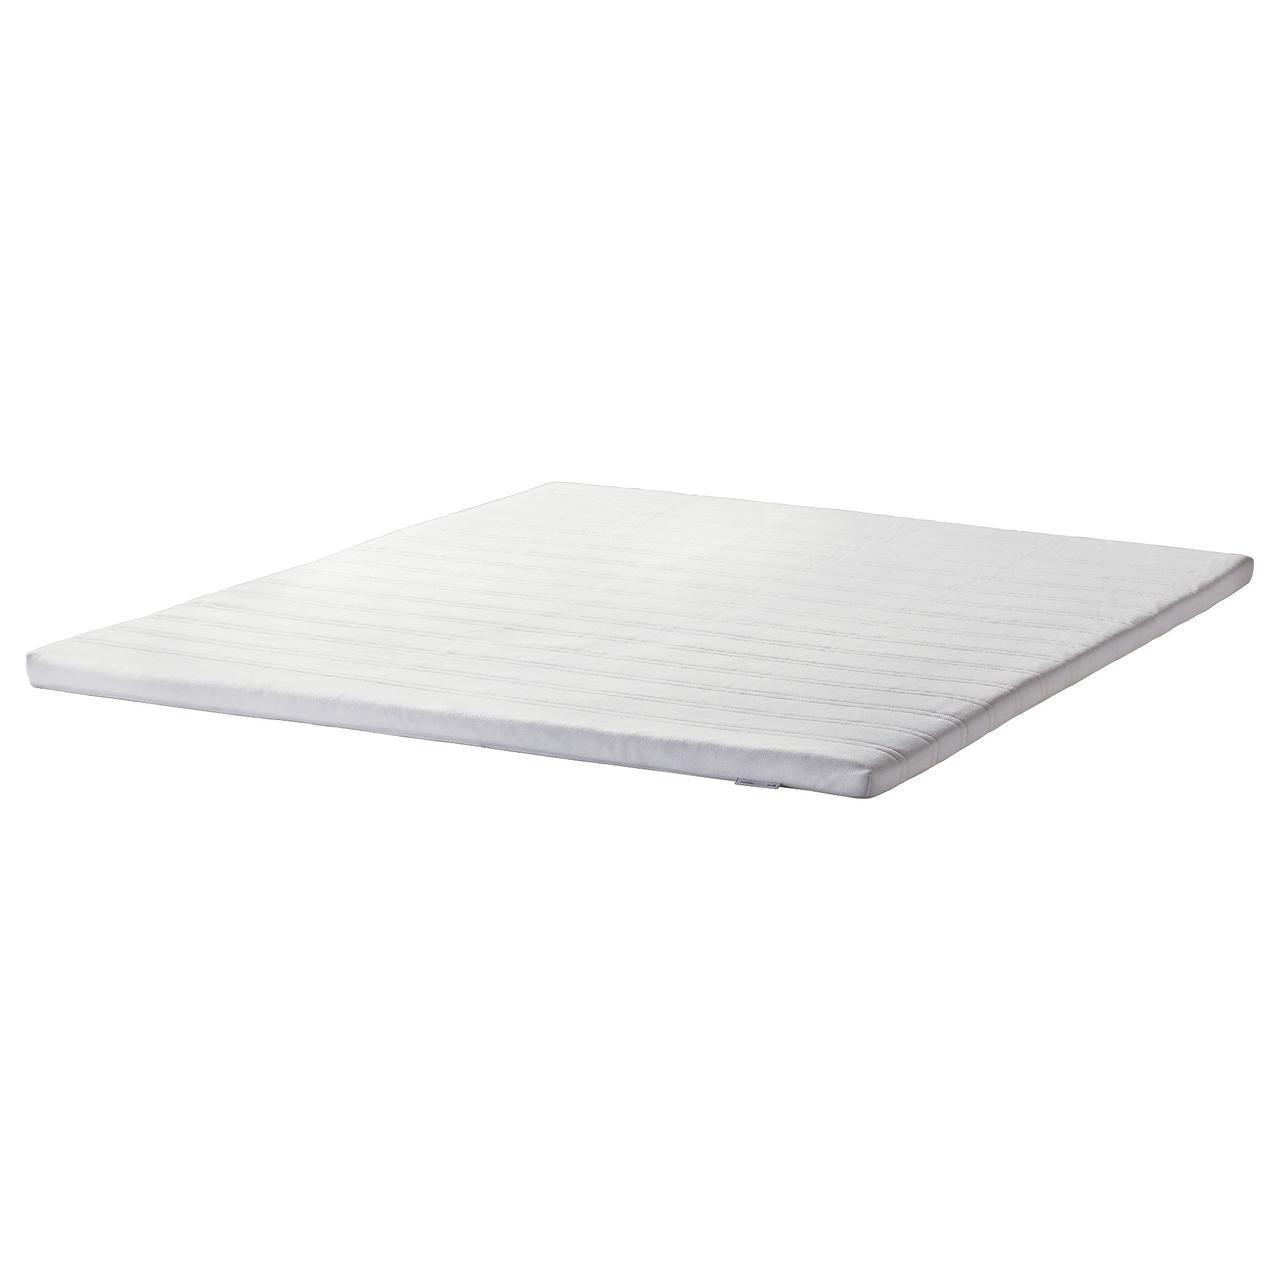 IKEA TUDDAL (302.981.84) Тонкий матрас, белый